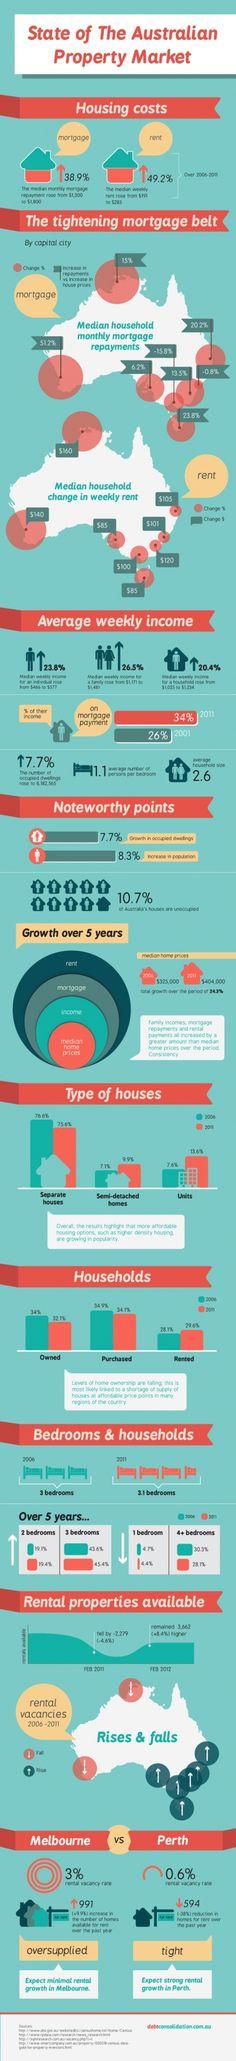 australian infographic http://www.reimaverick.com/how-is-the-australian-property-market-infographic/